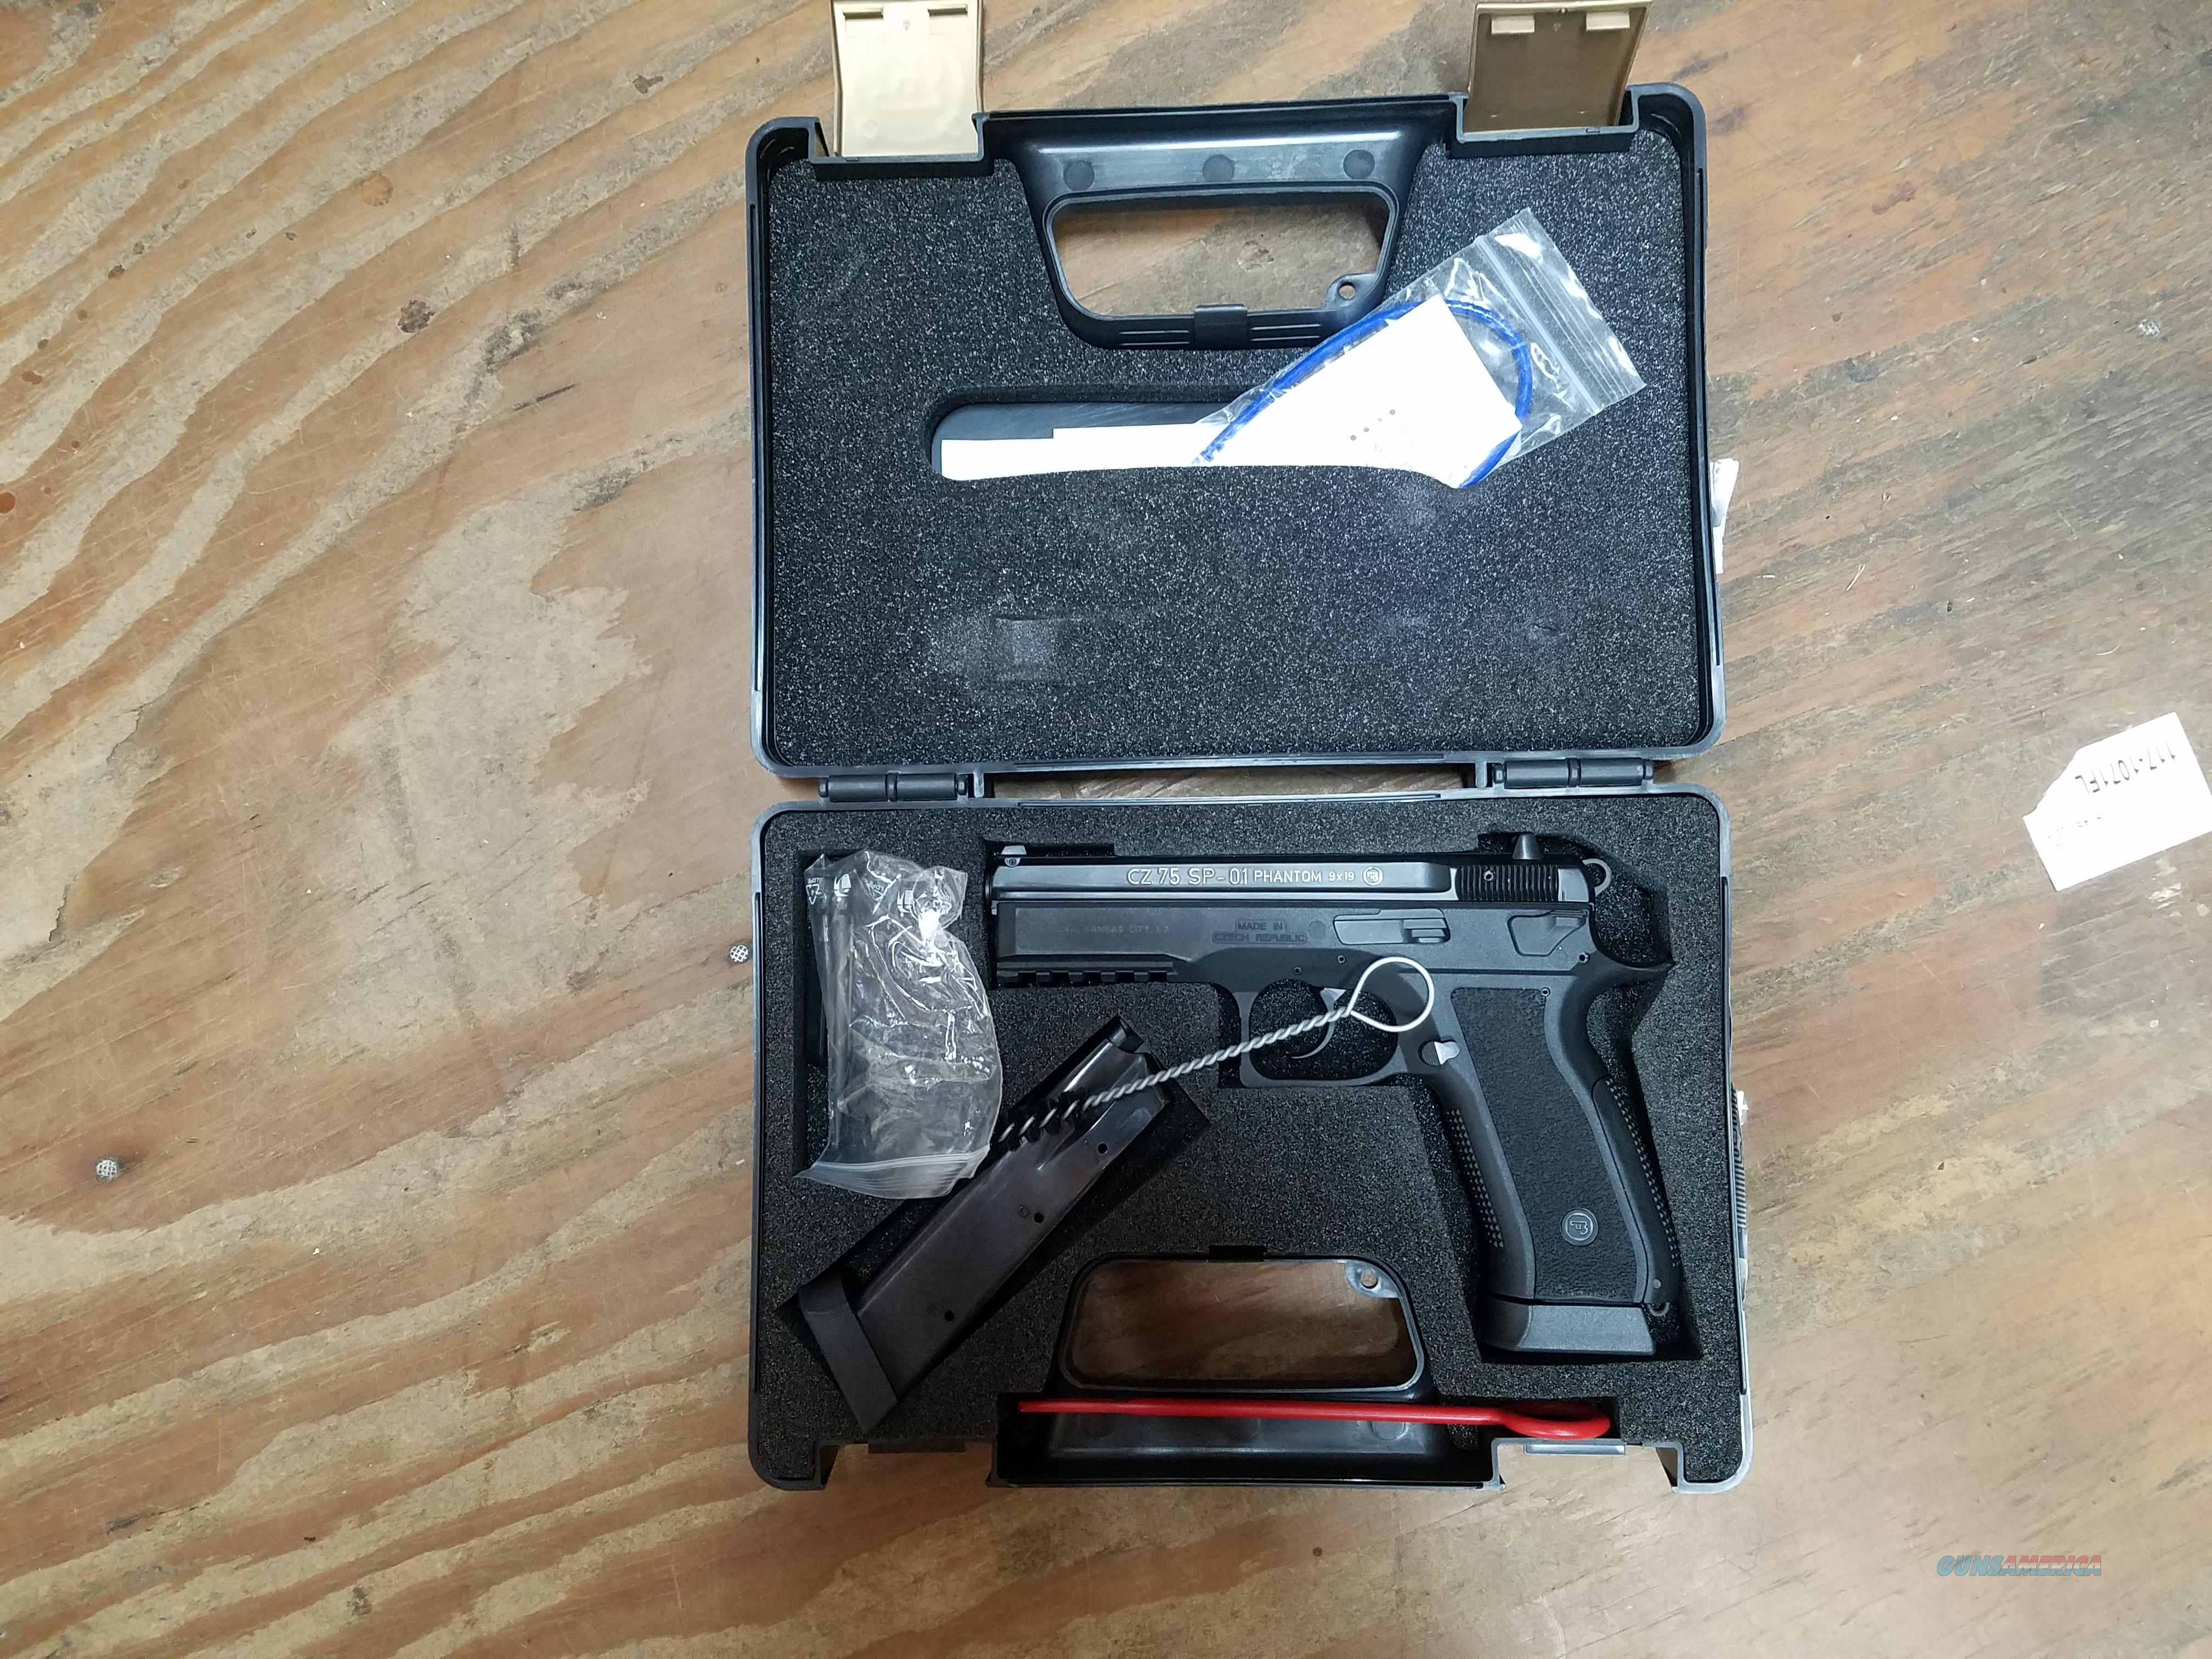 CZA Used SP-01 Phantom 9MM Luger Black Pistol 91258  Guns > Pistols > CZ Pistols